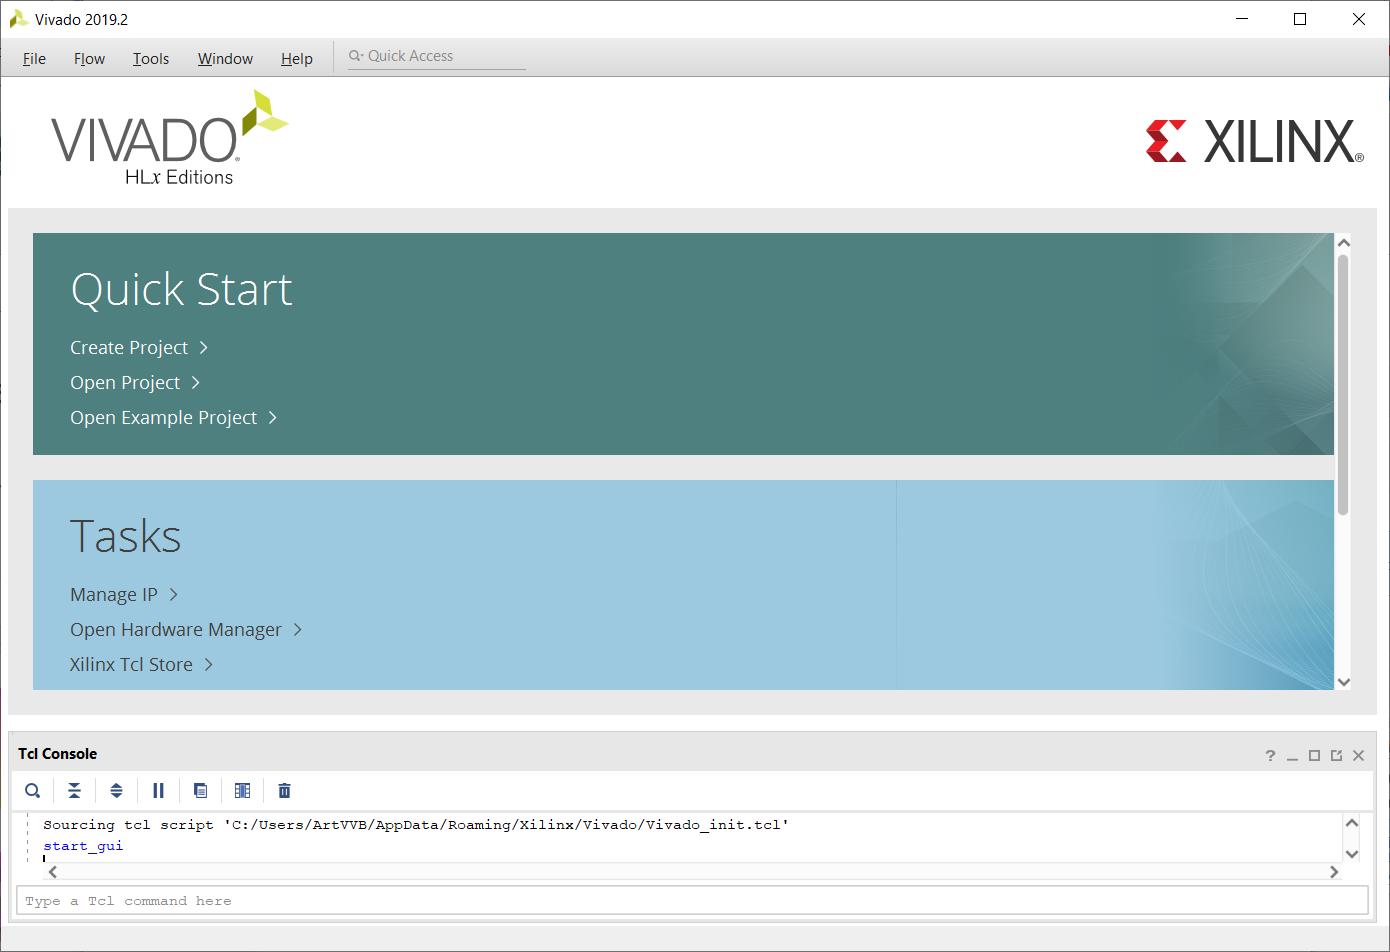 The Vivado Start Page